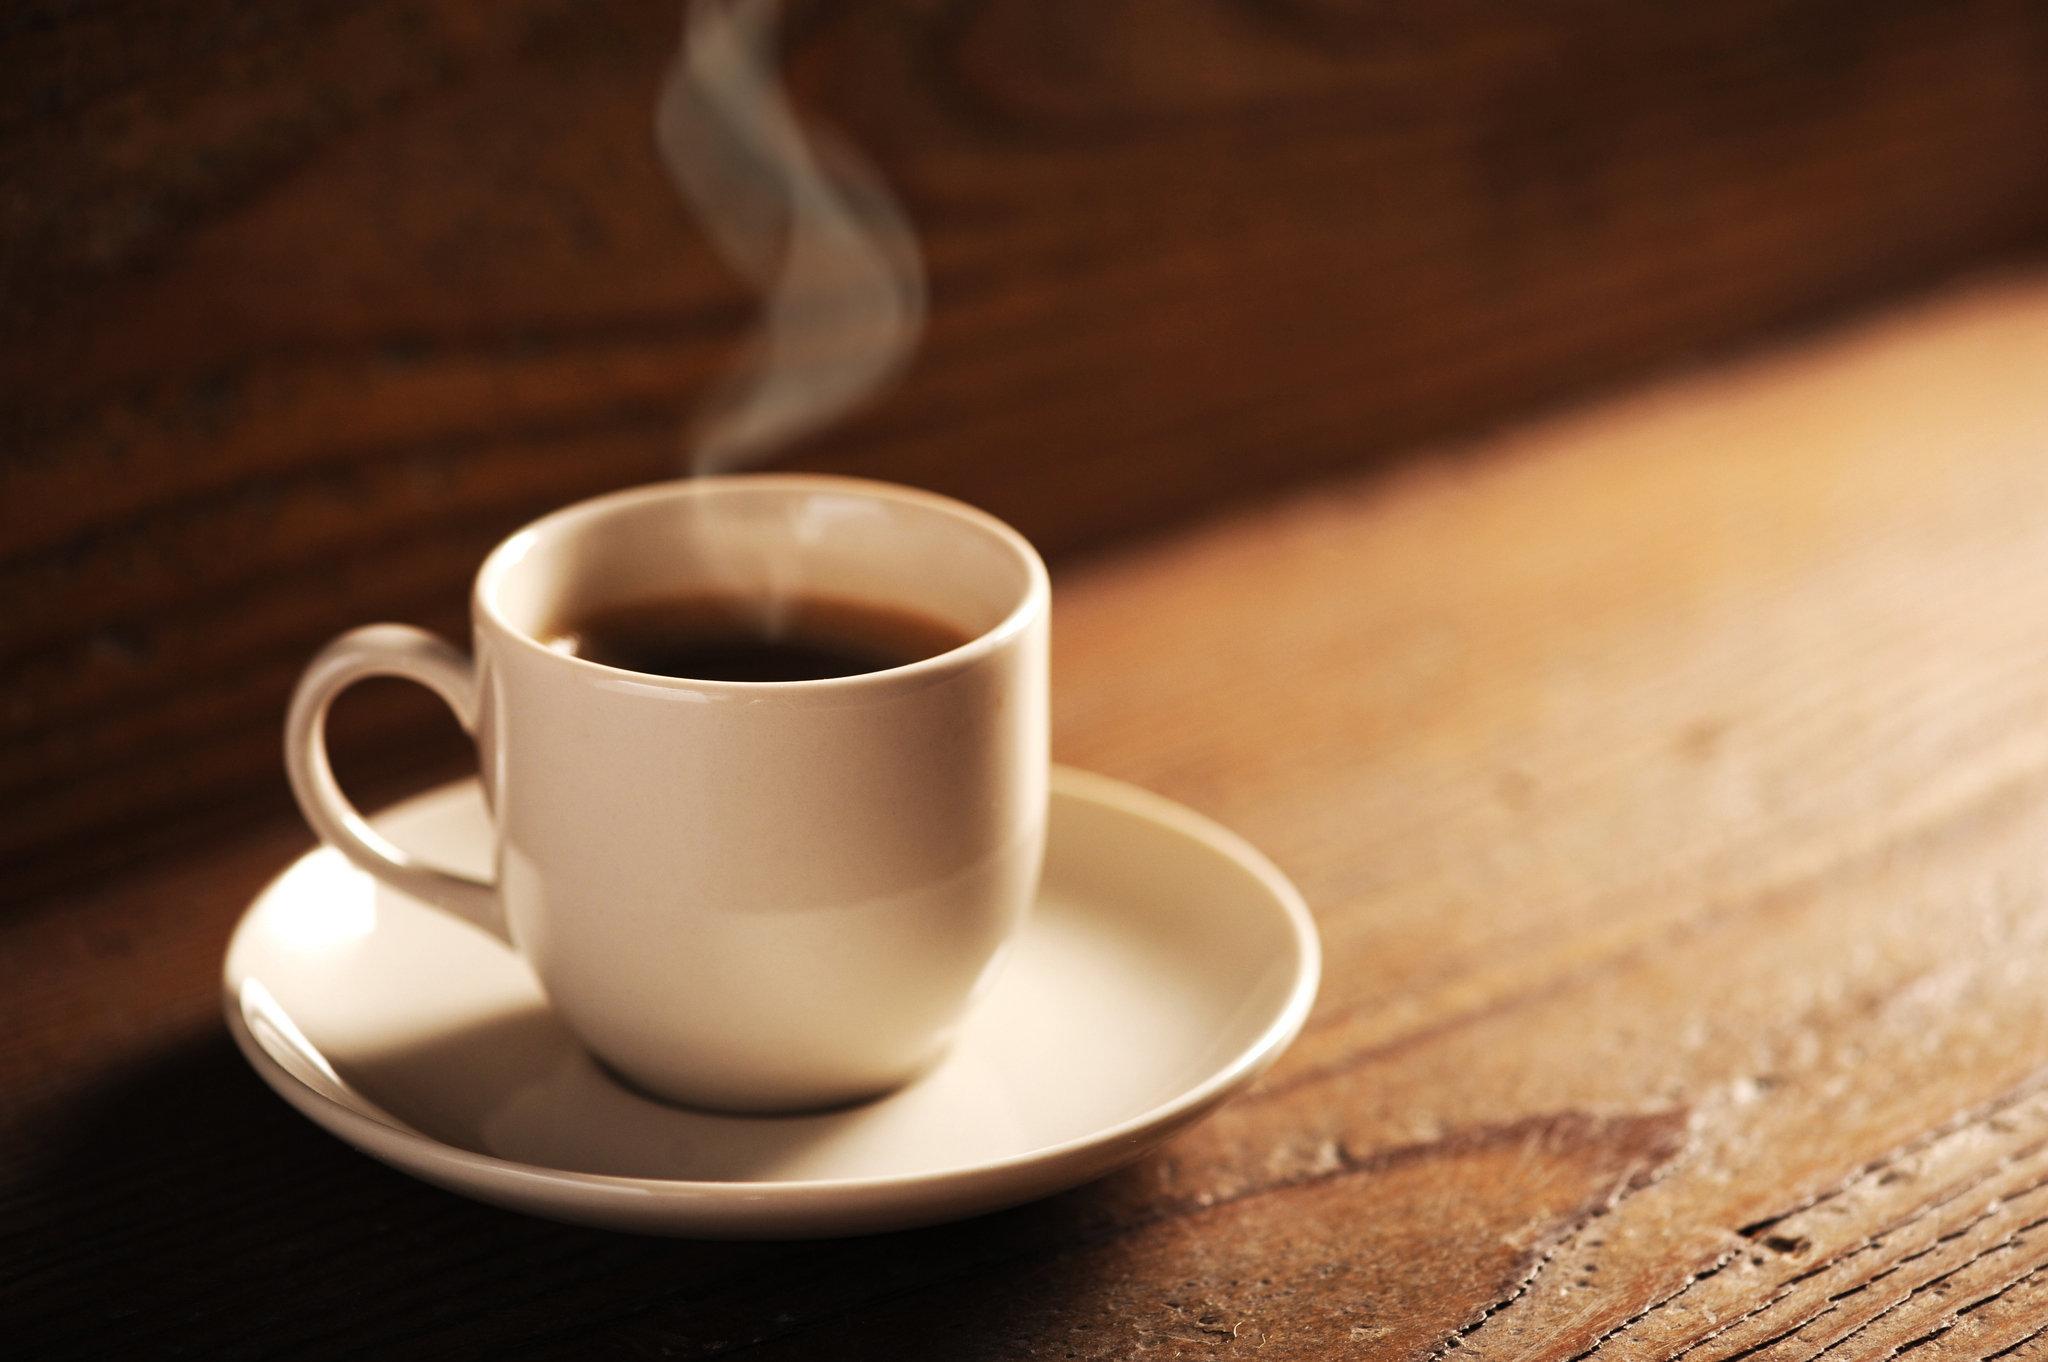 Coffee mornings at St. Peter's Church Canterbury, Kent